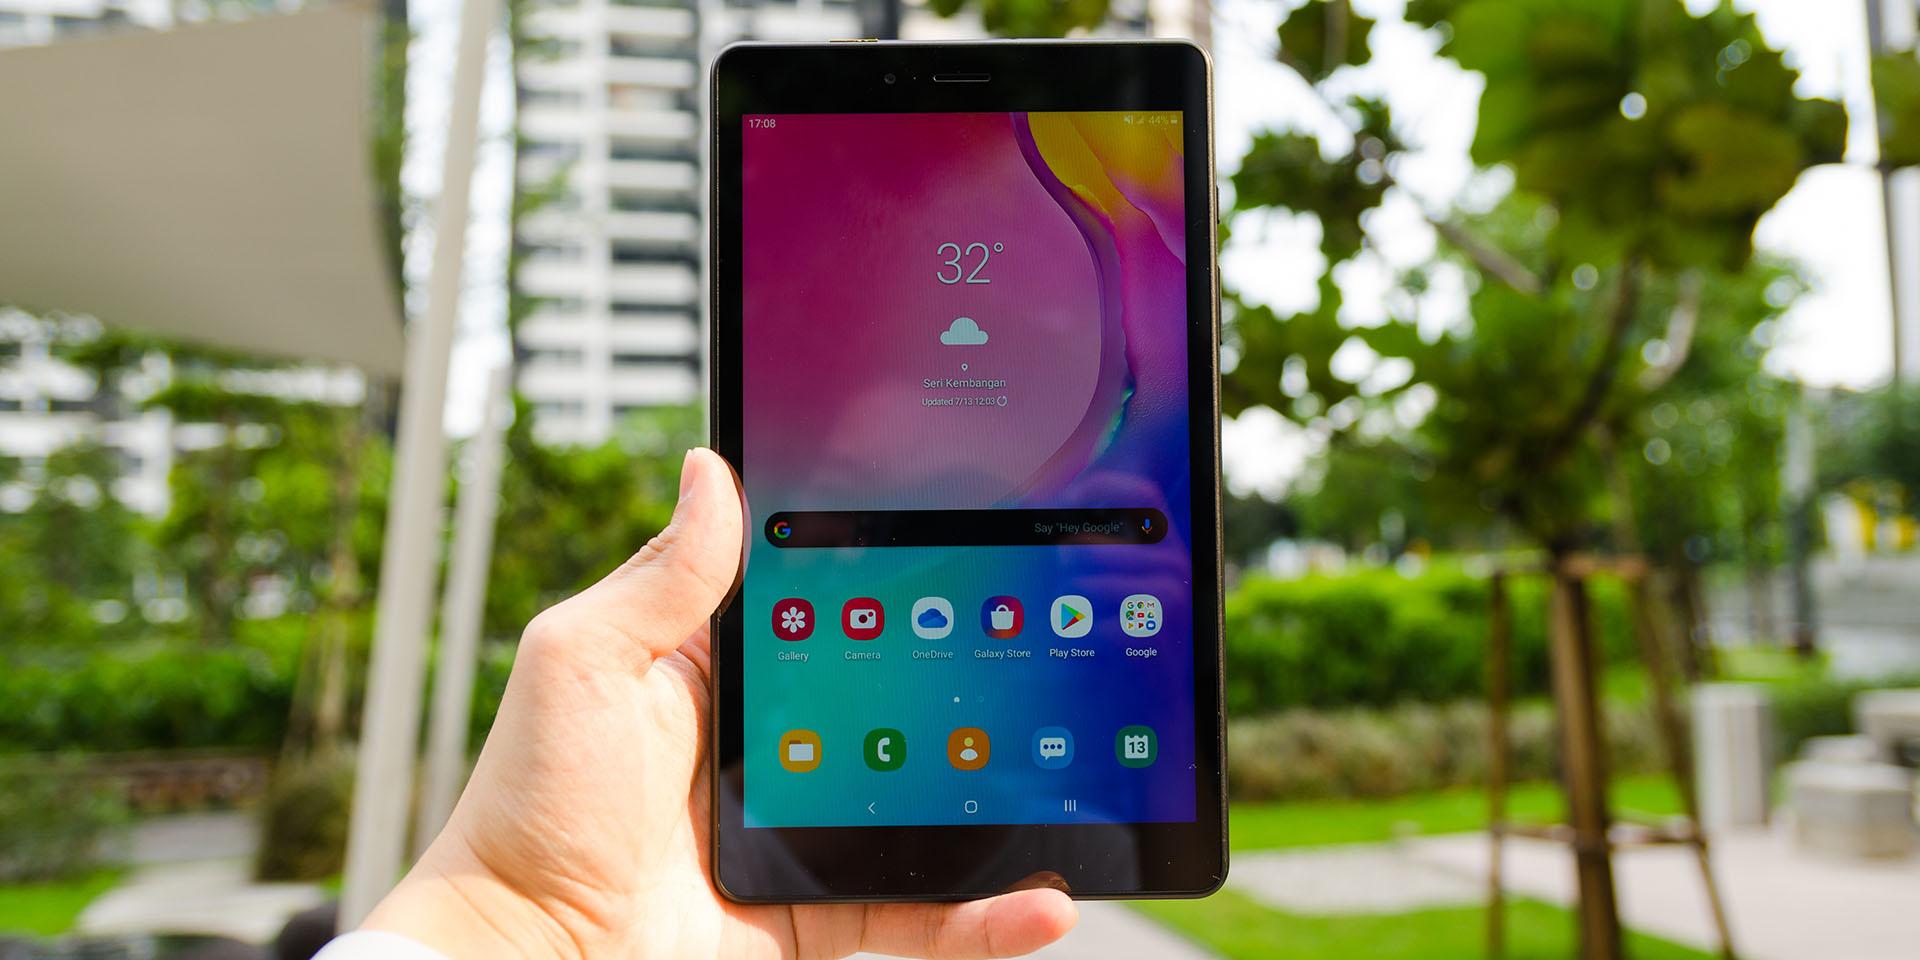 Review - Samsung Galaxy Tab A 8.0 (2019): The RM599 tablet | Nasi Lemak Tech